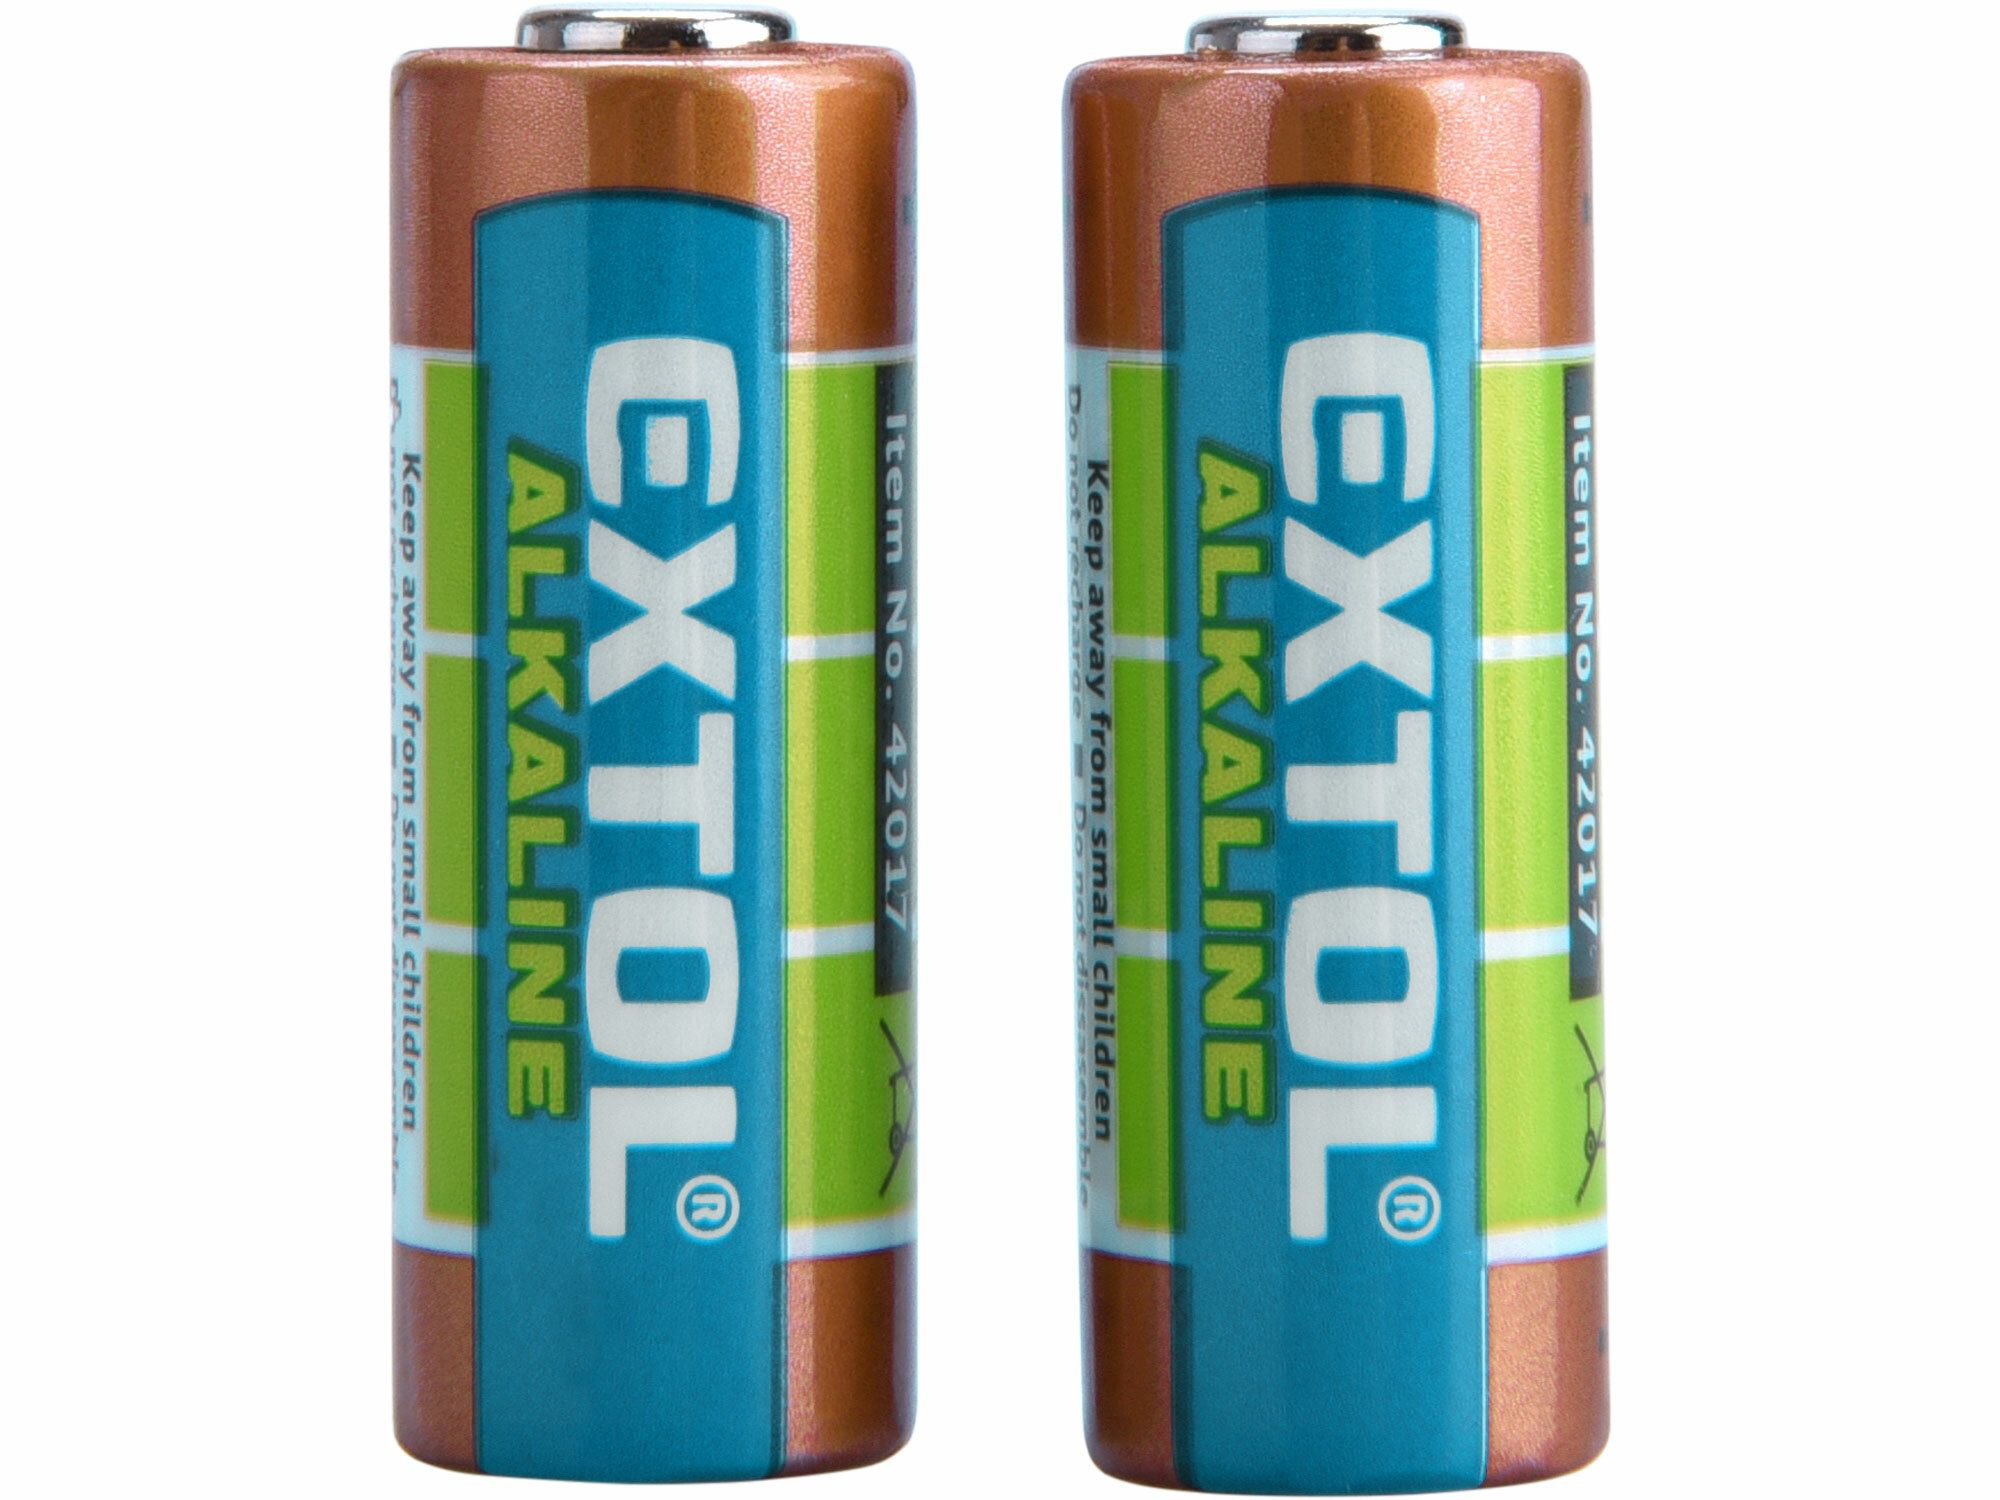 Baterie alkalické, 2ks, 12V (23A), EXTOL ENERGY